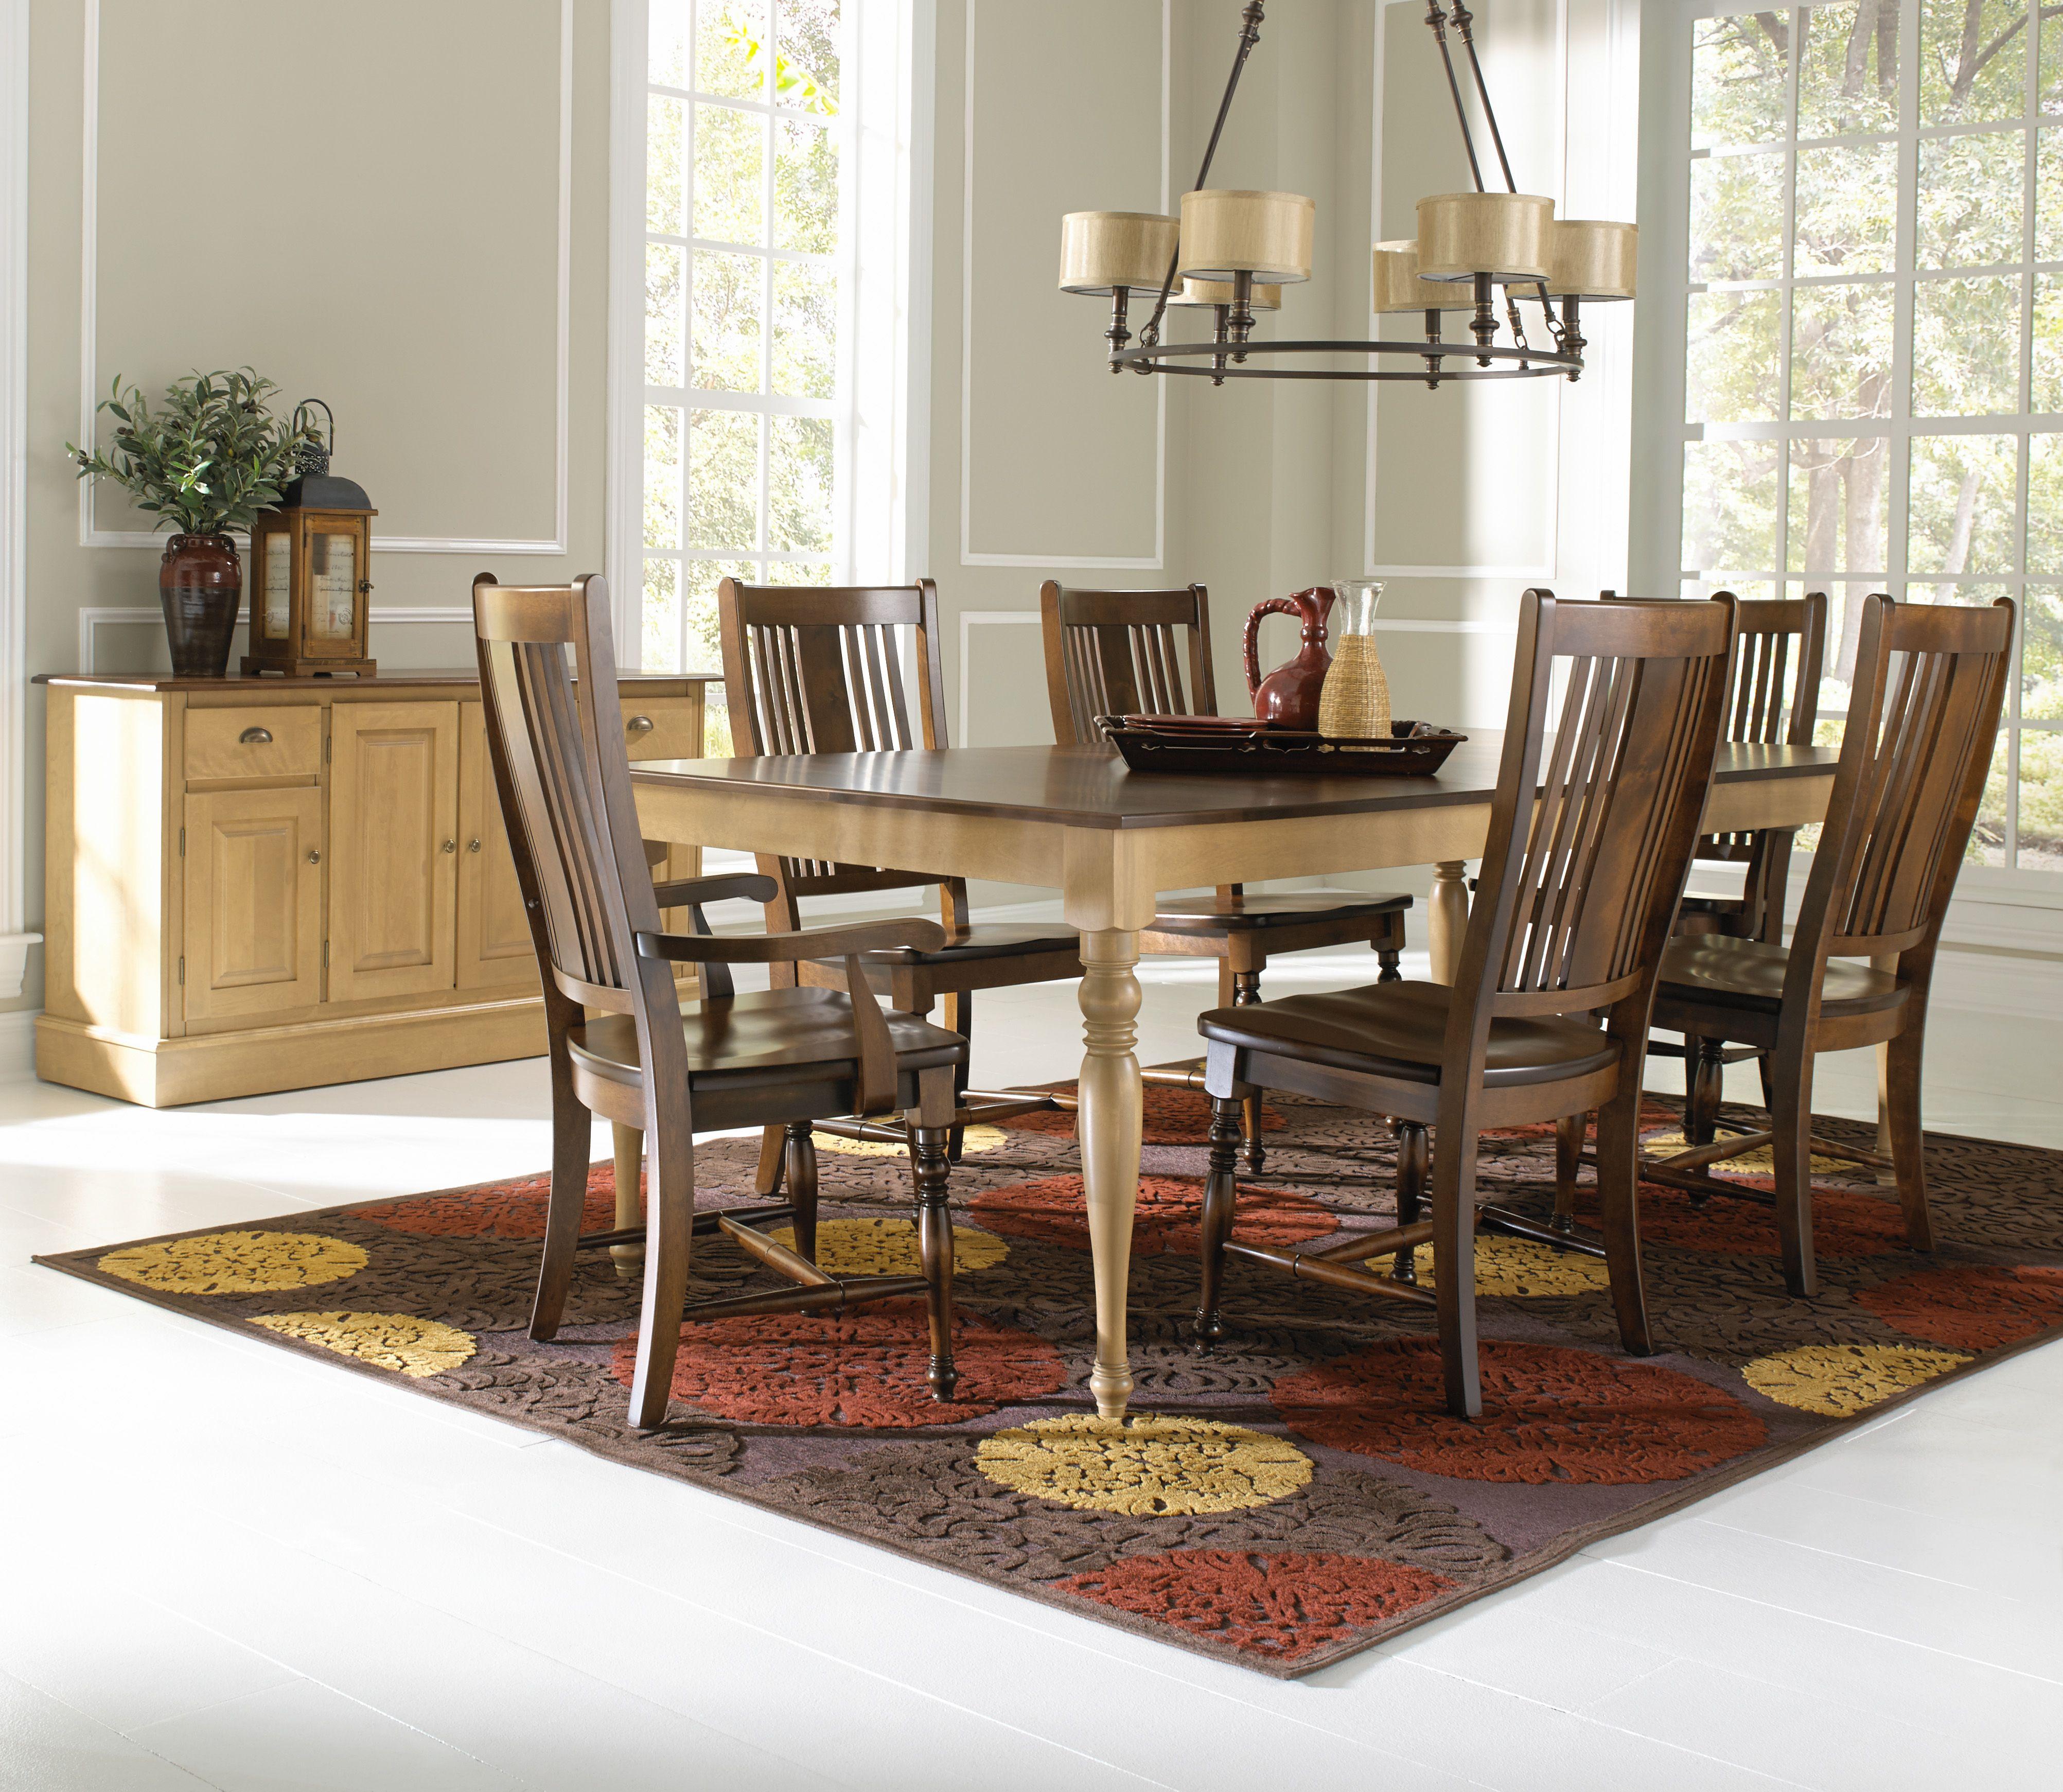 Canadel Loft 7 Piece Dining Set Kitchen sets